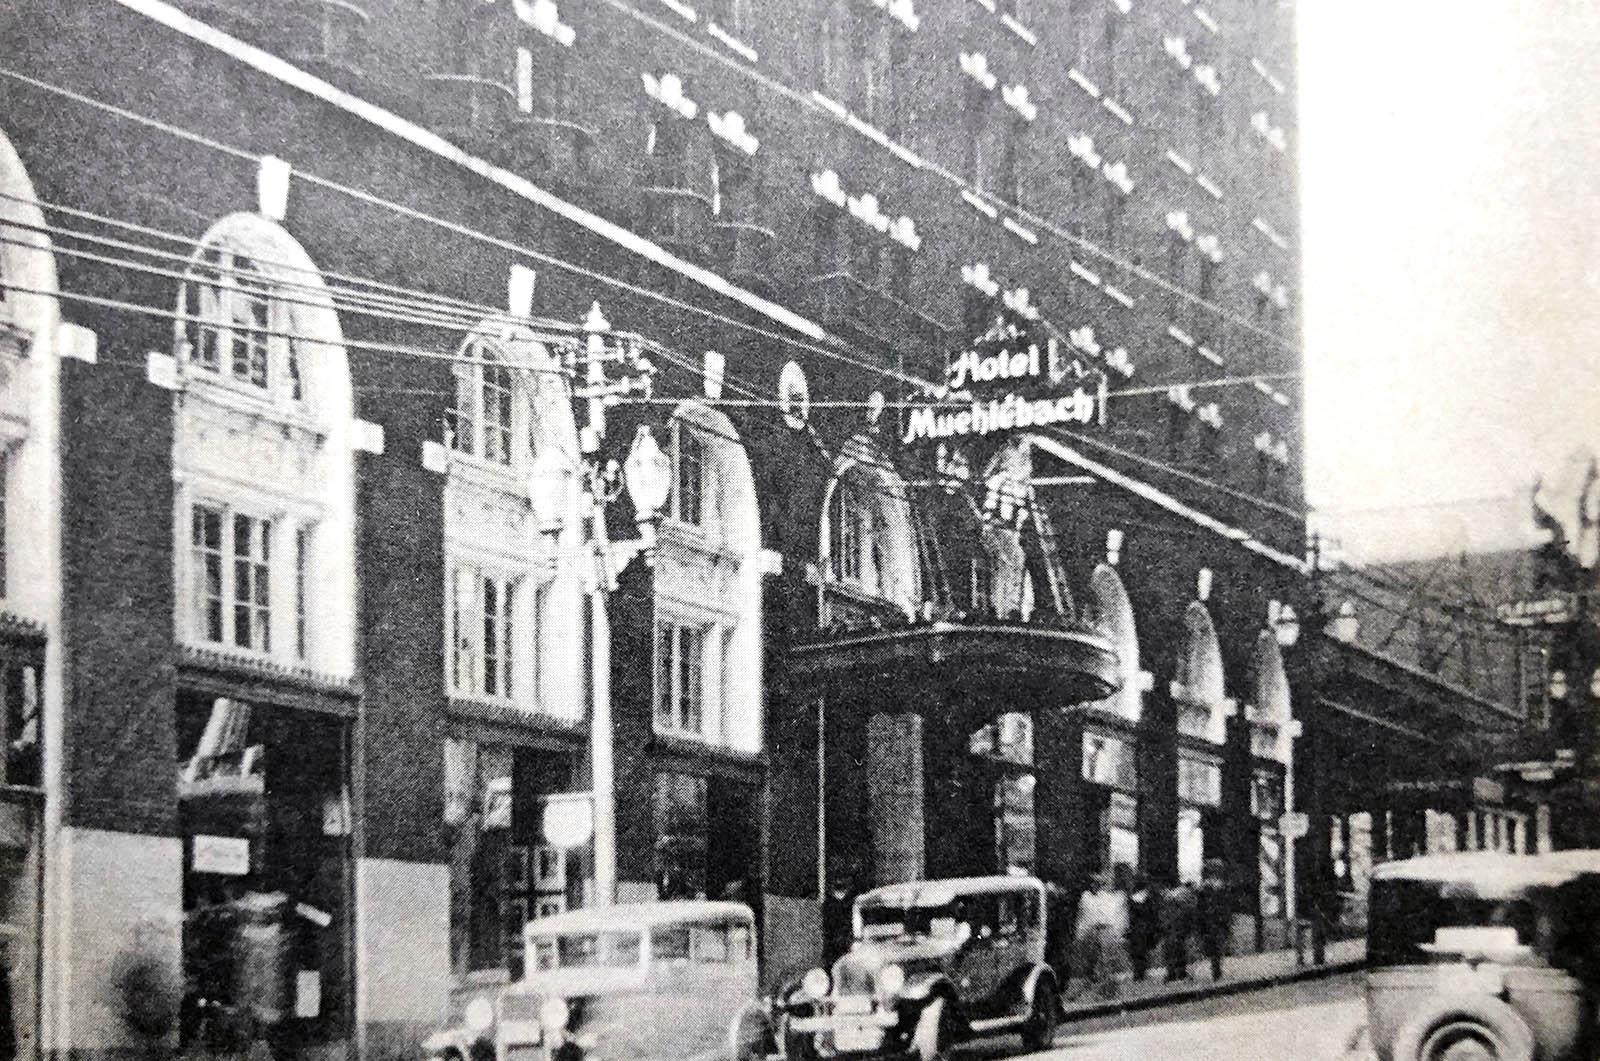 Vintage exterior